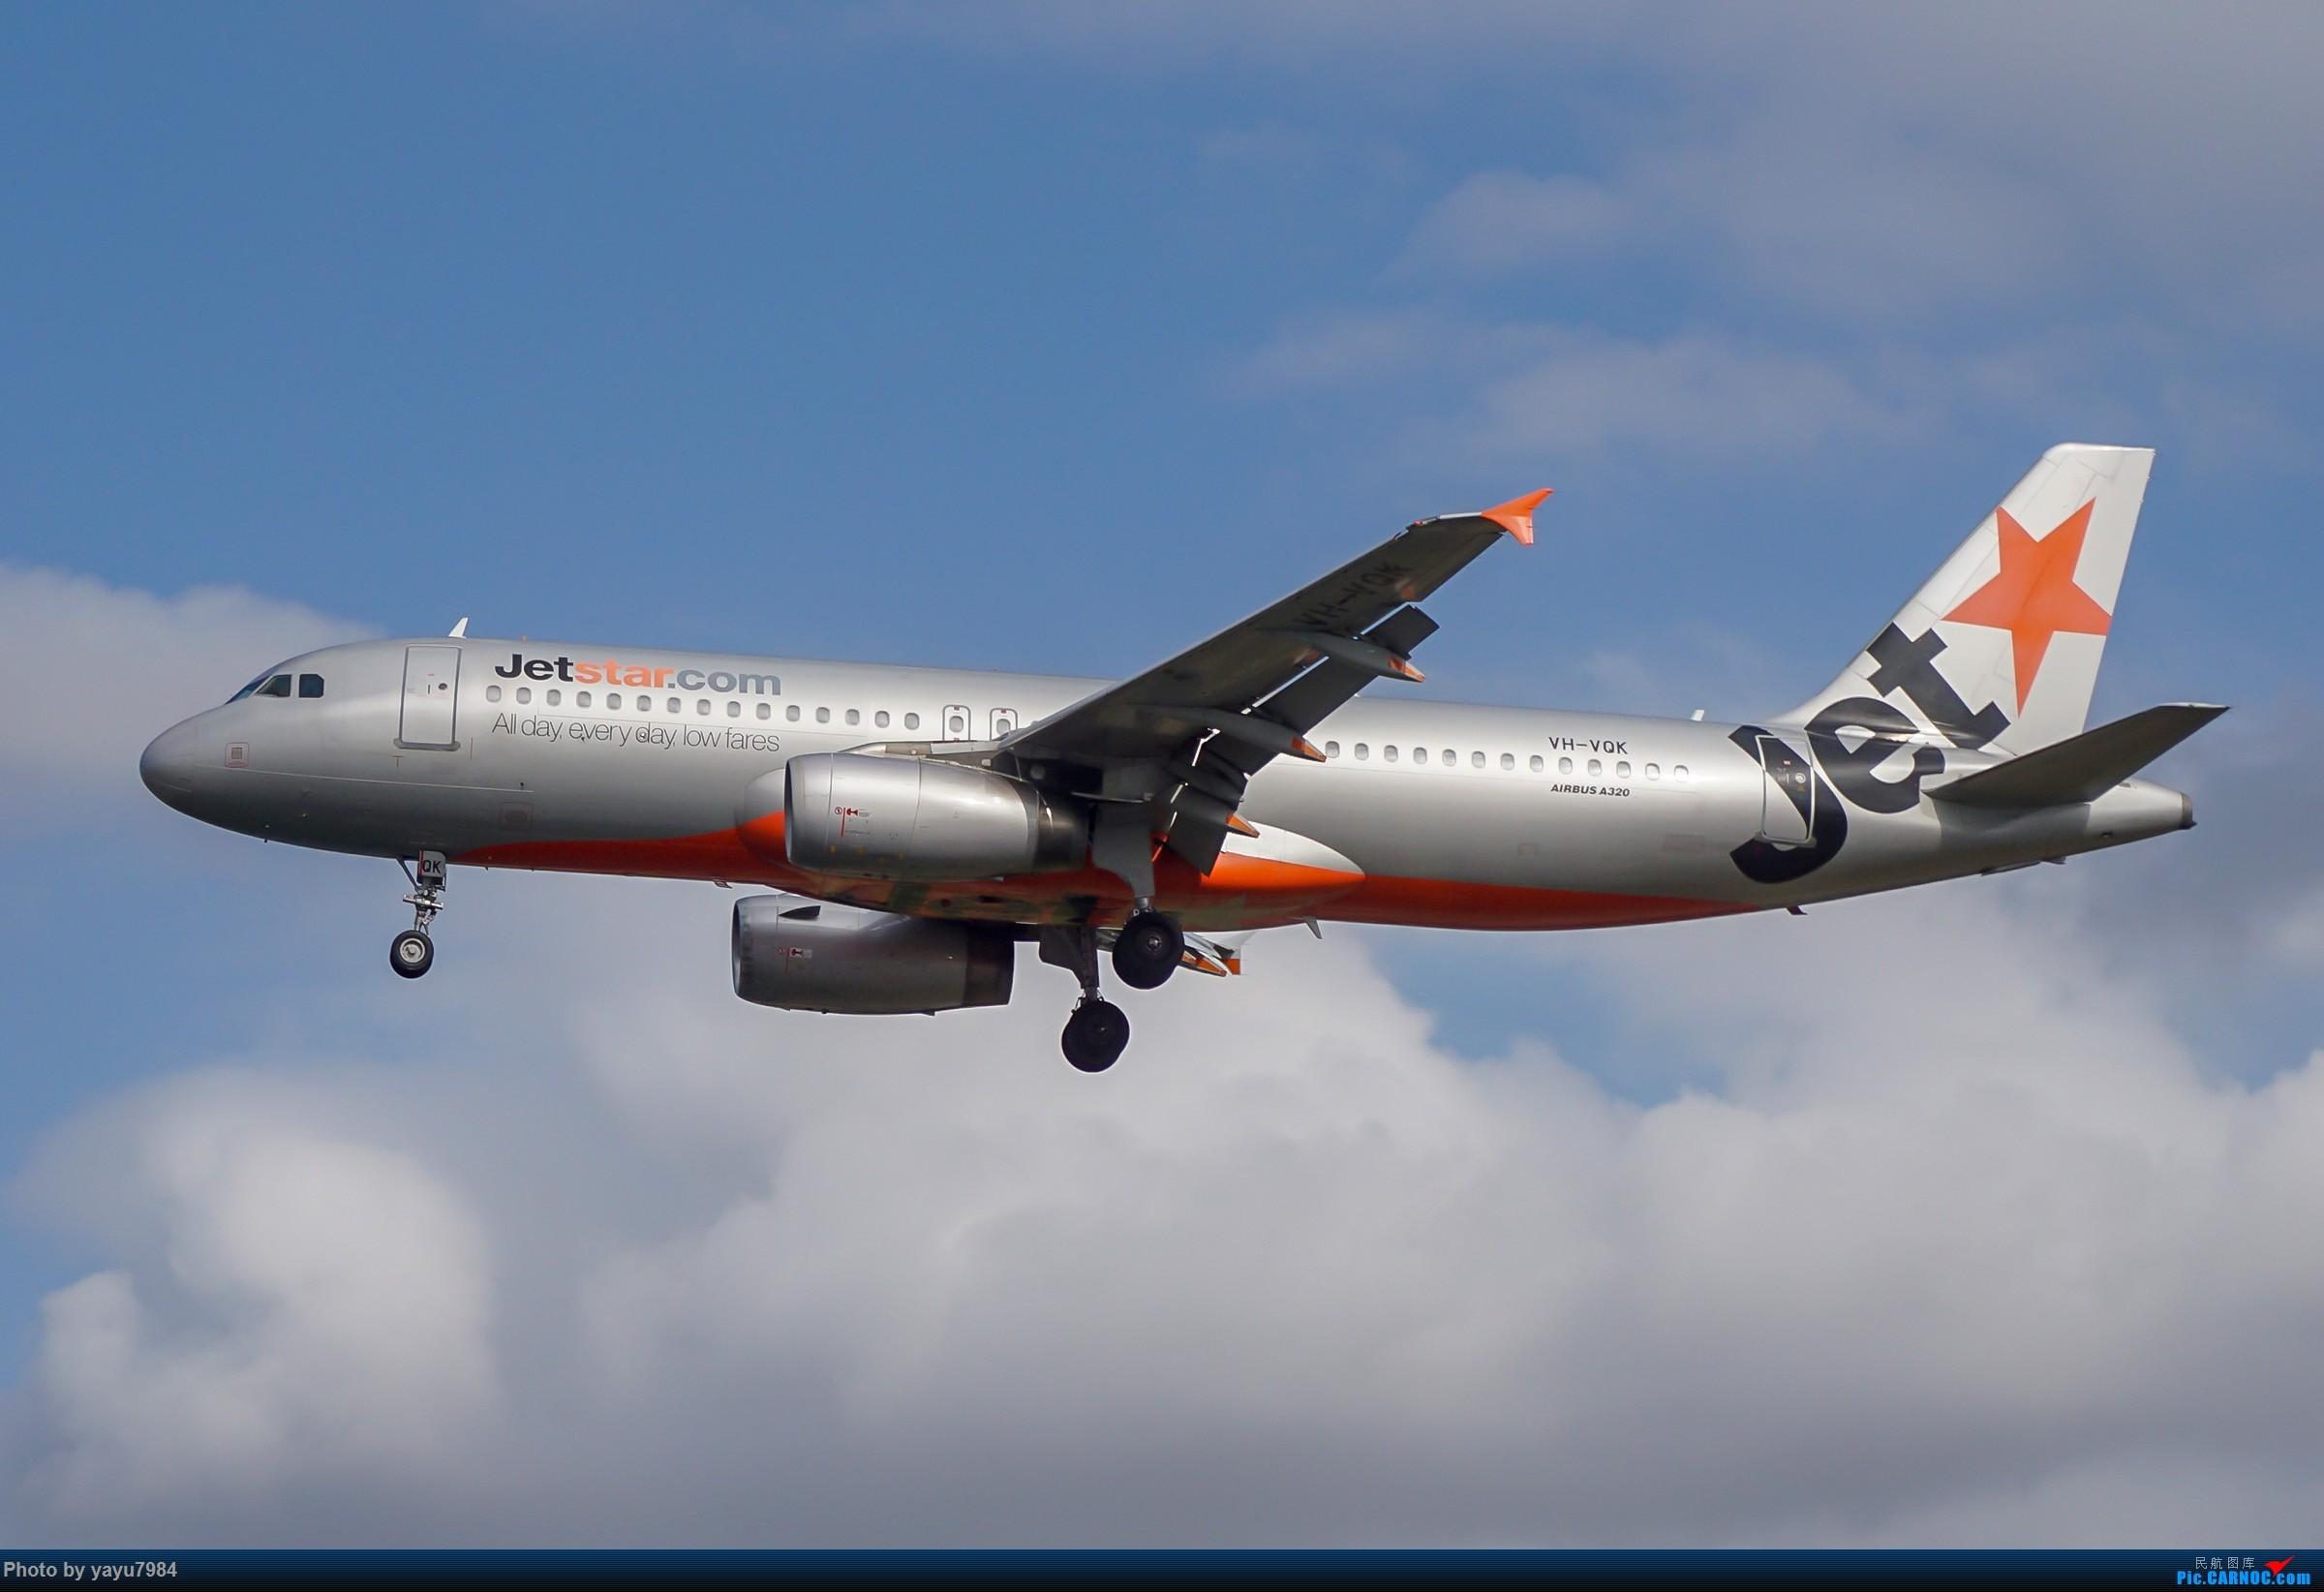 Re:[原创][SYD] 东航天合332,雪绒花343,华航蓝鹊,以及其他日常货 AIRBUS A320-200 VH-VQK 澳大利亚悉尼金斯福德·史密斯机场